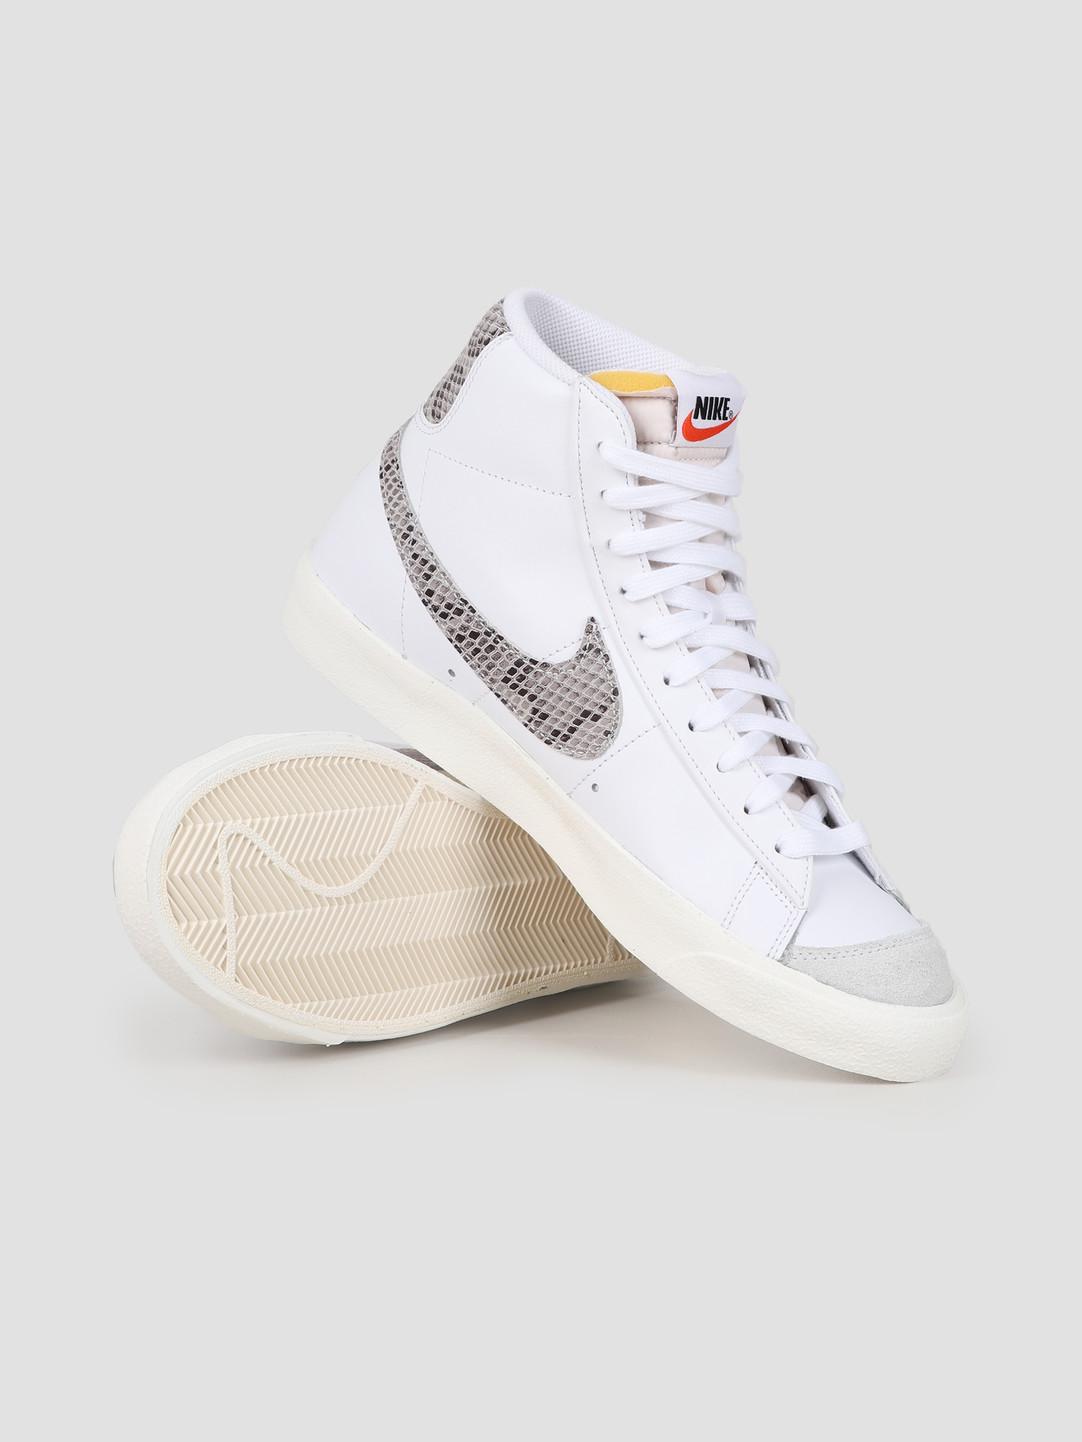 new style cost charm cheap prices Nike Blazer Mid 77 Vintage White Sail Ci1176-101